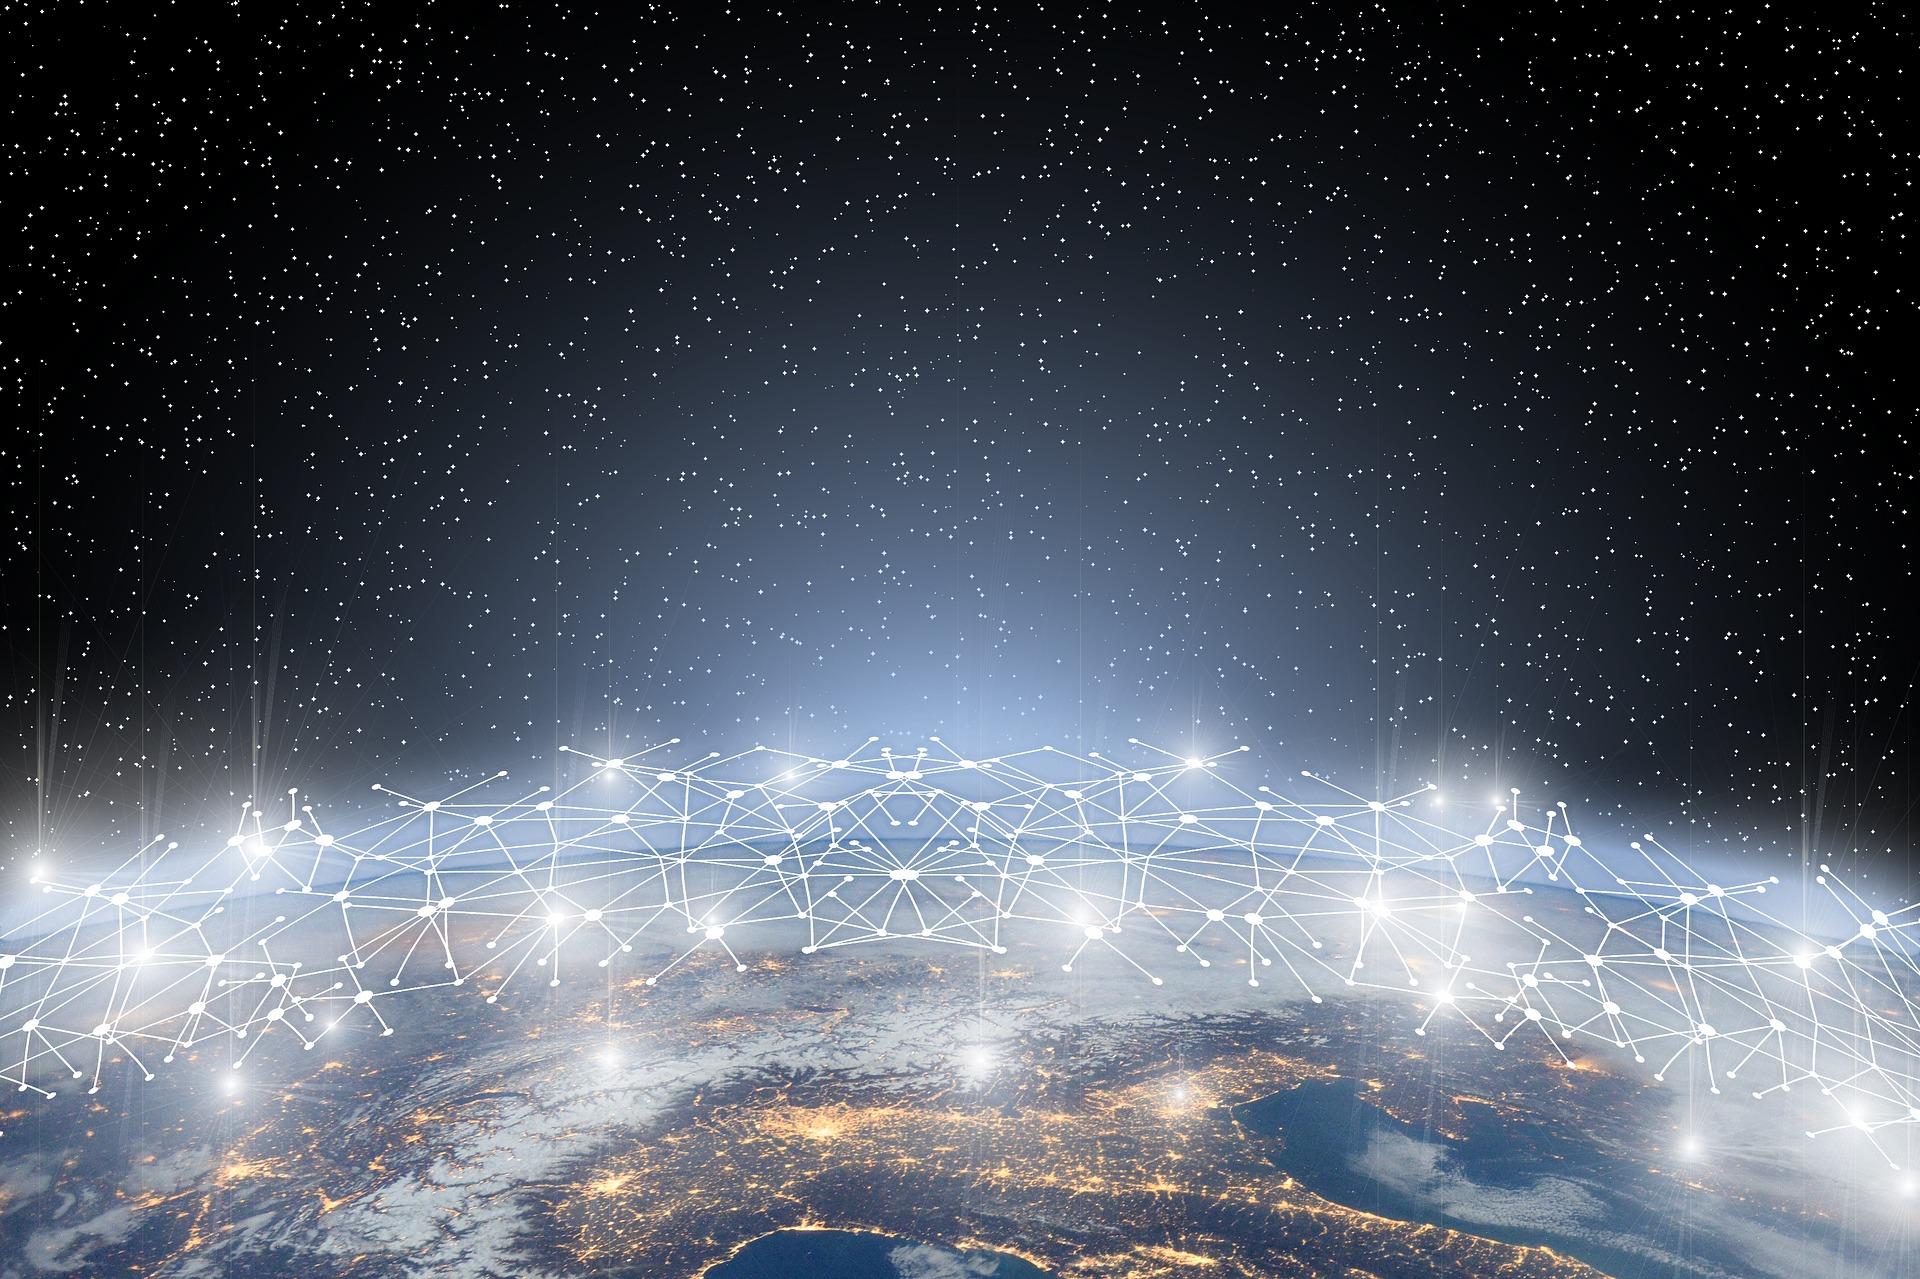 network-3524352_1920